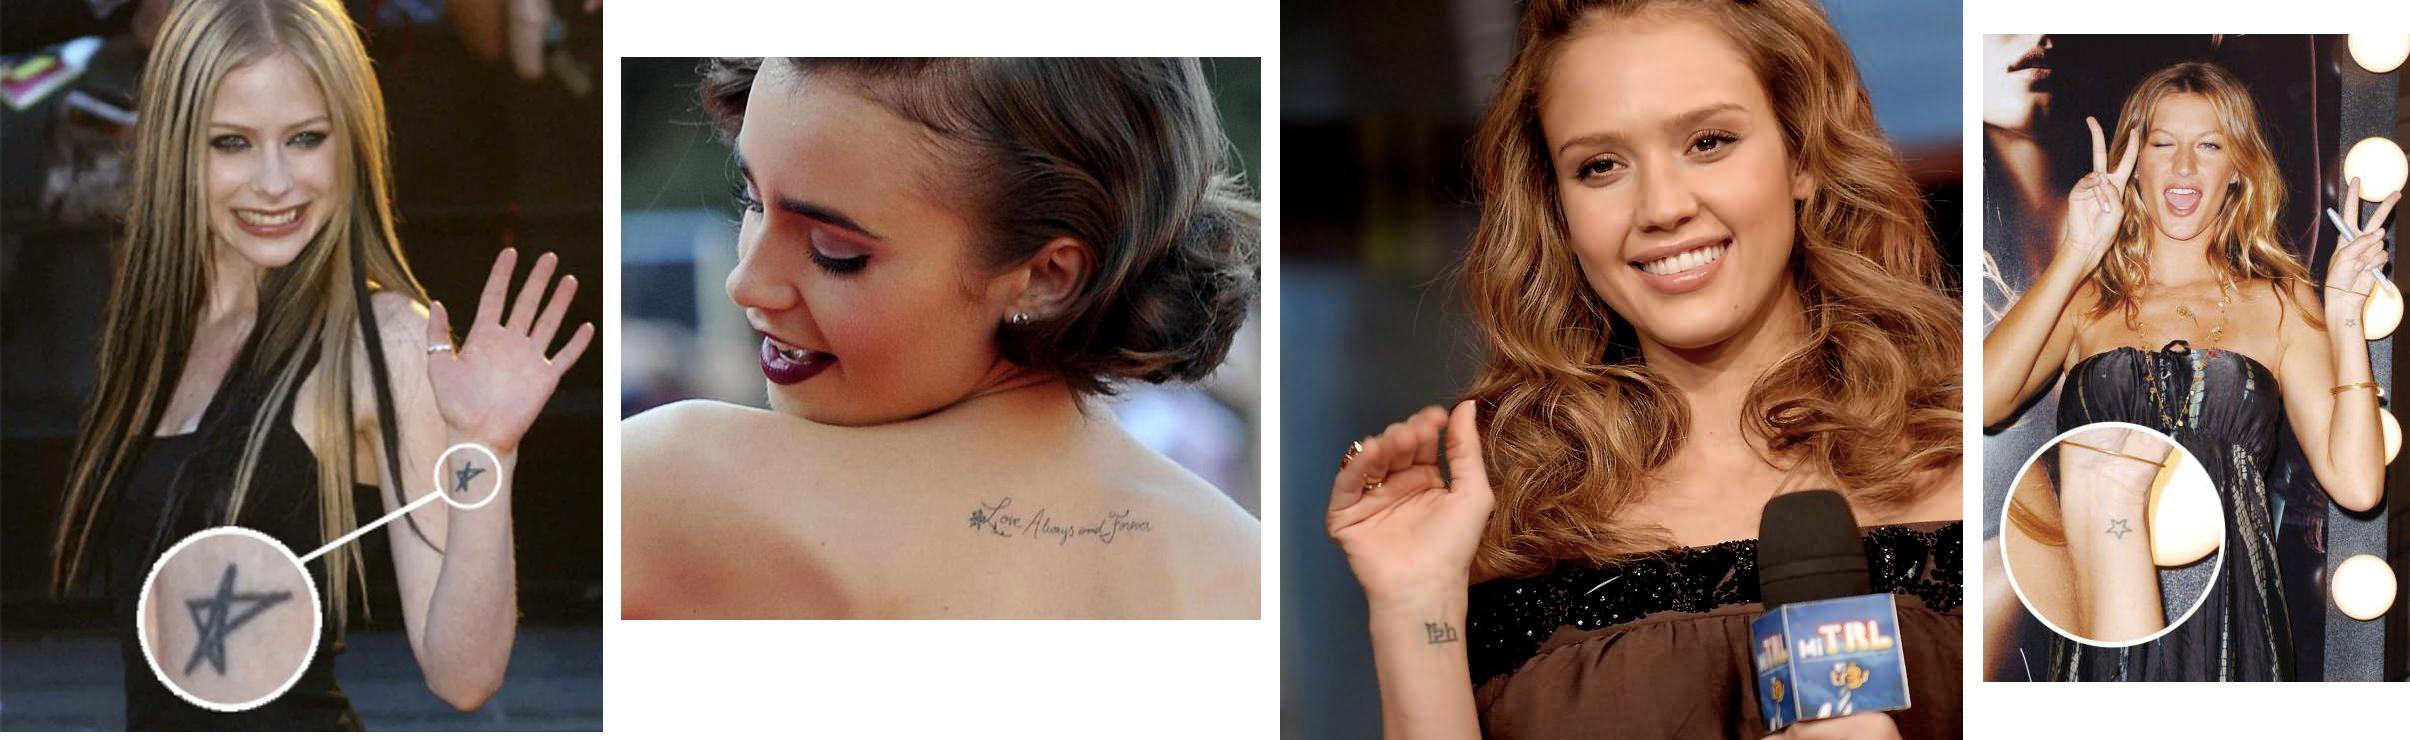 Tatuaggio Tattoo Elegante Femminile Star Vip